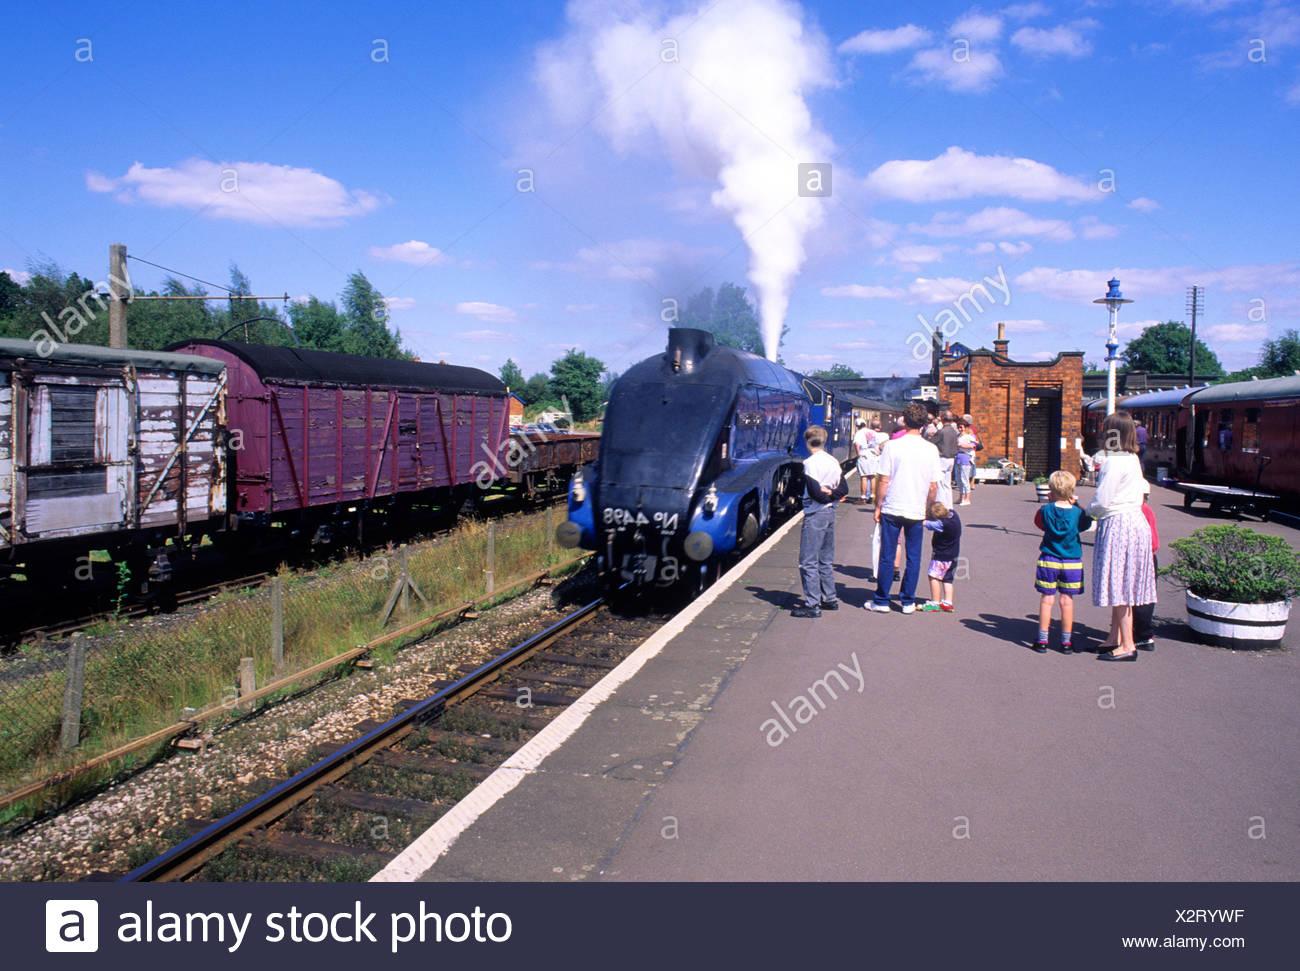 Rothley Leicestershire Sir Nigel Gressley people steam train engine platform blue streamline transport vintage England UK - Stock Image